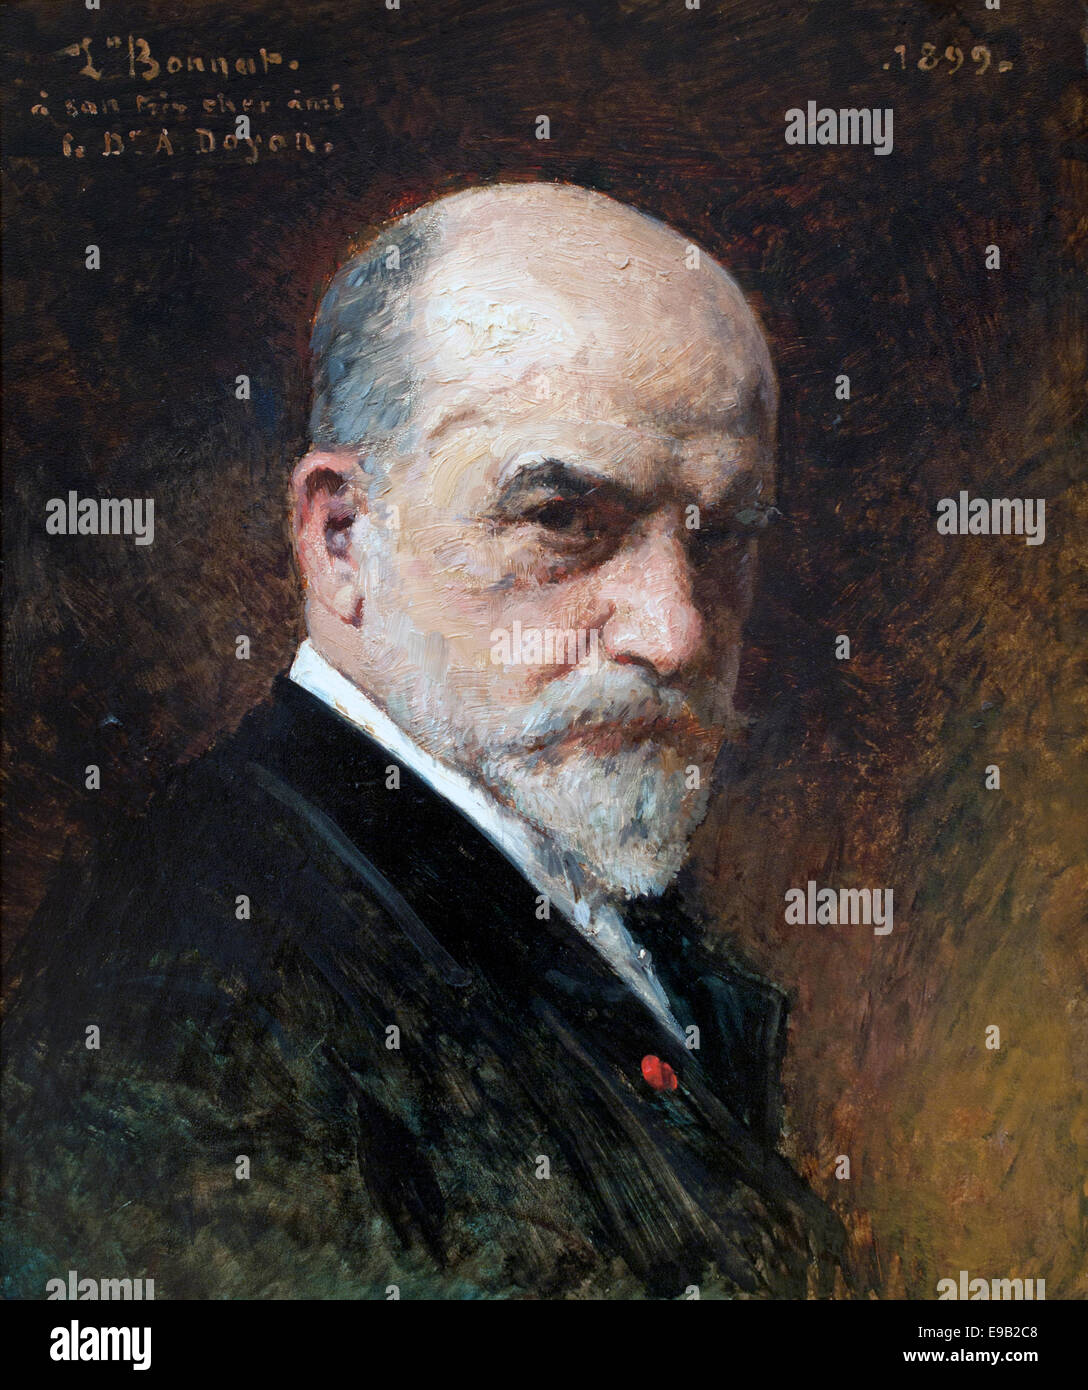 Portrait of the author 1899  Leo Bonnart 1834-1923 France French - Stock Image